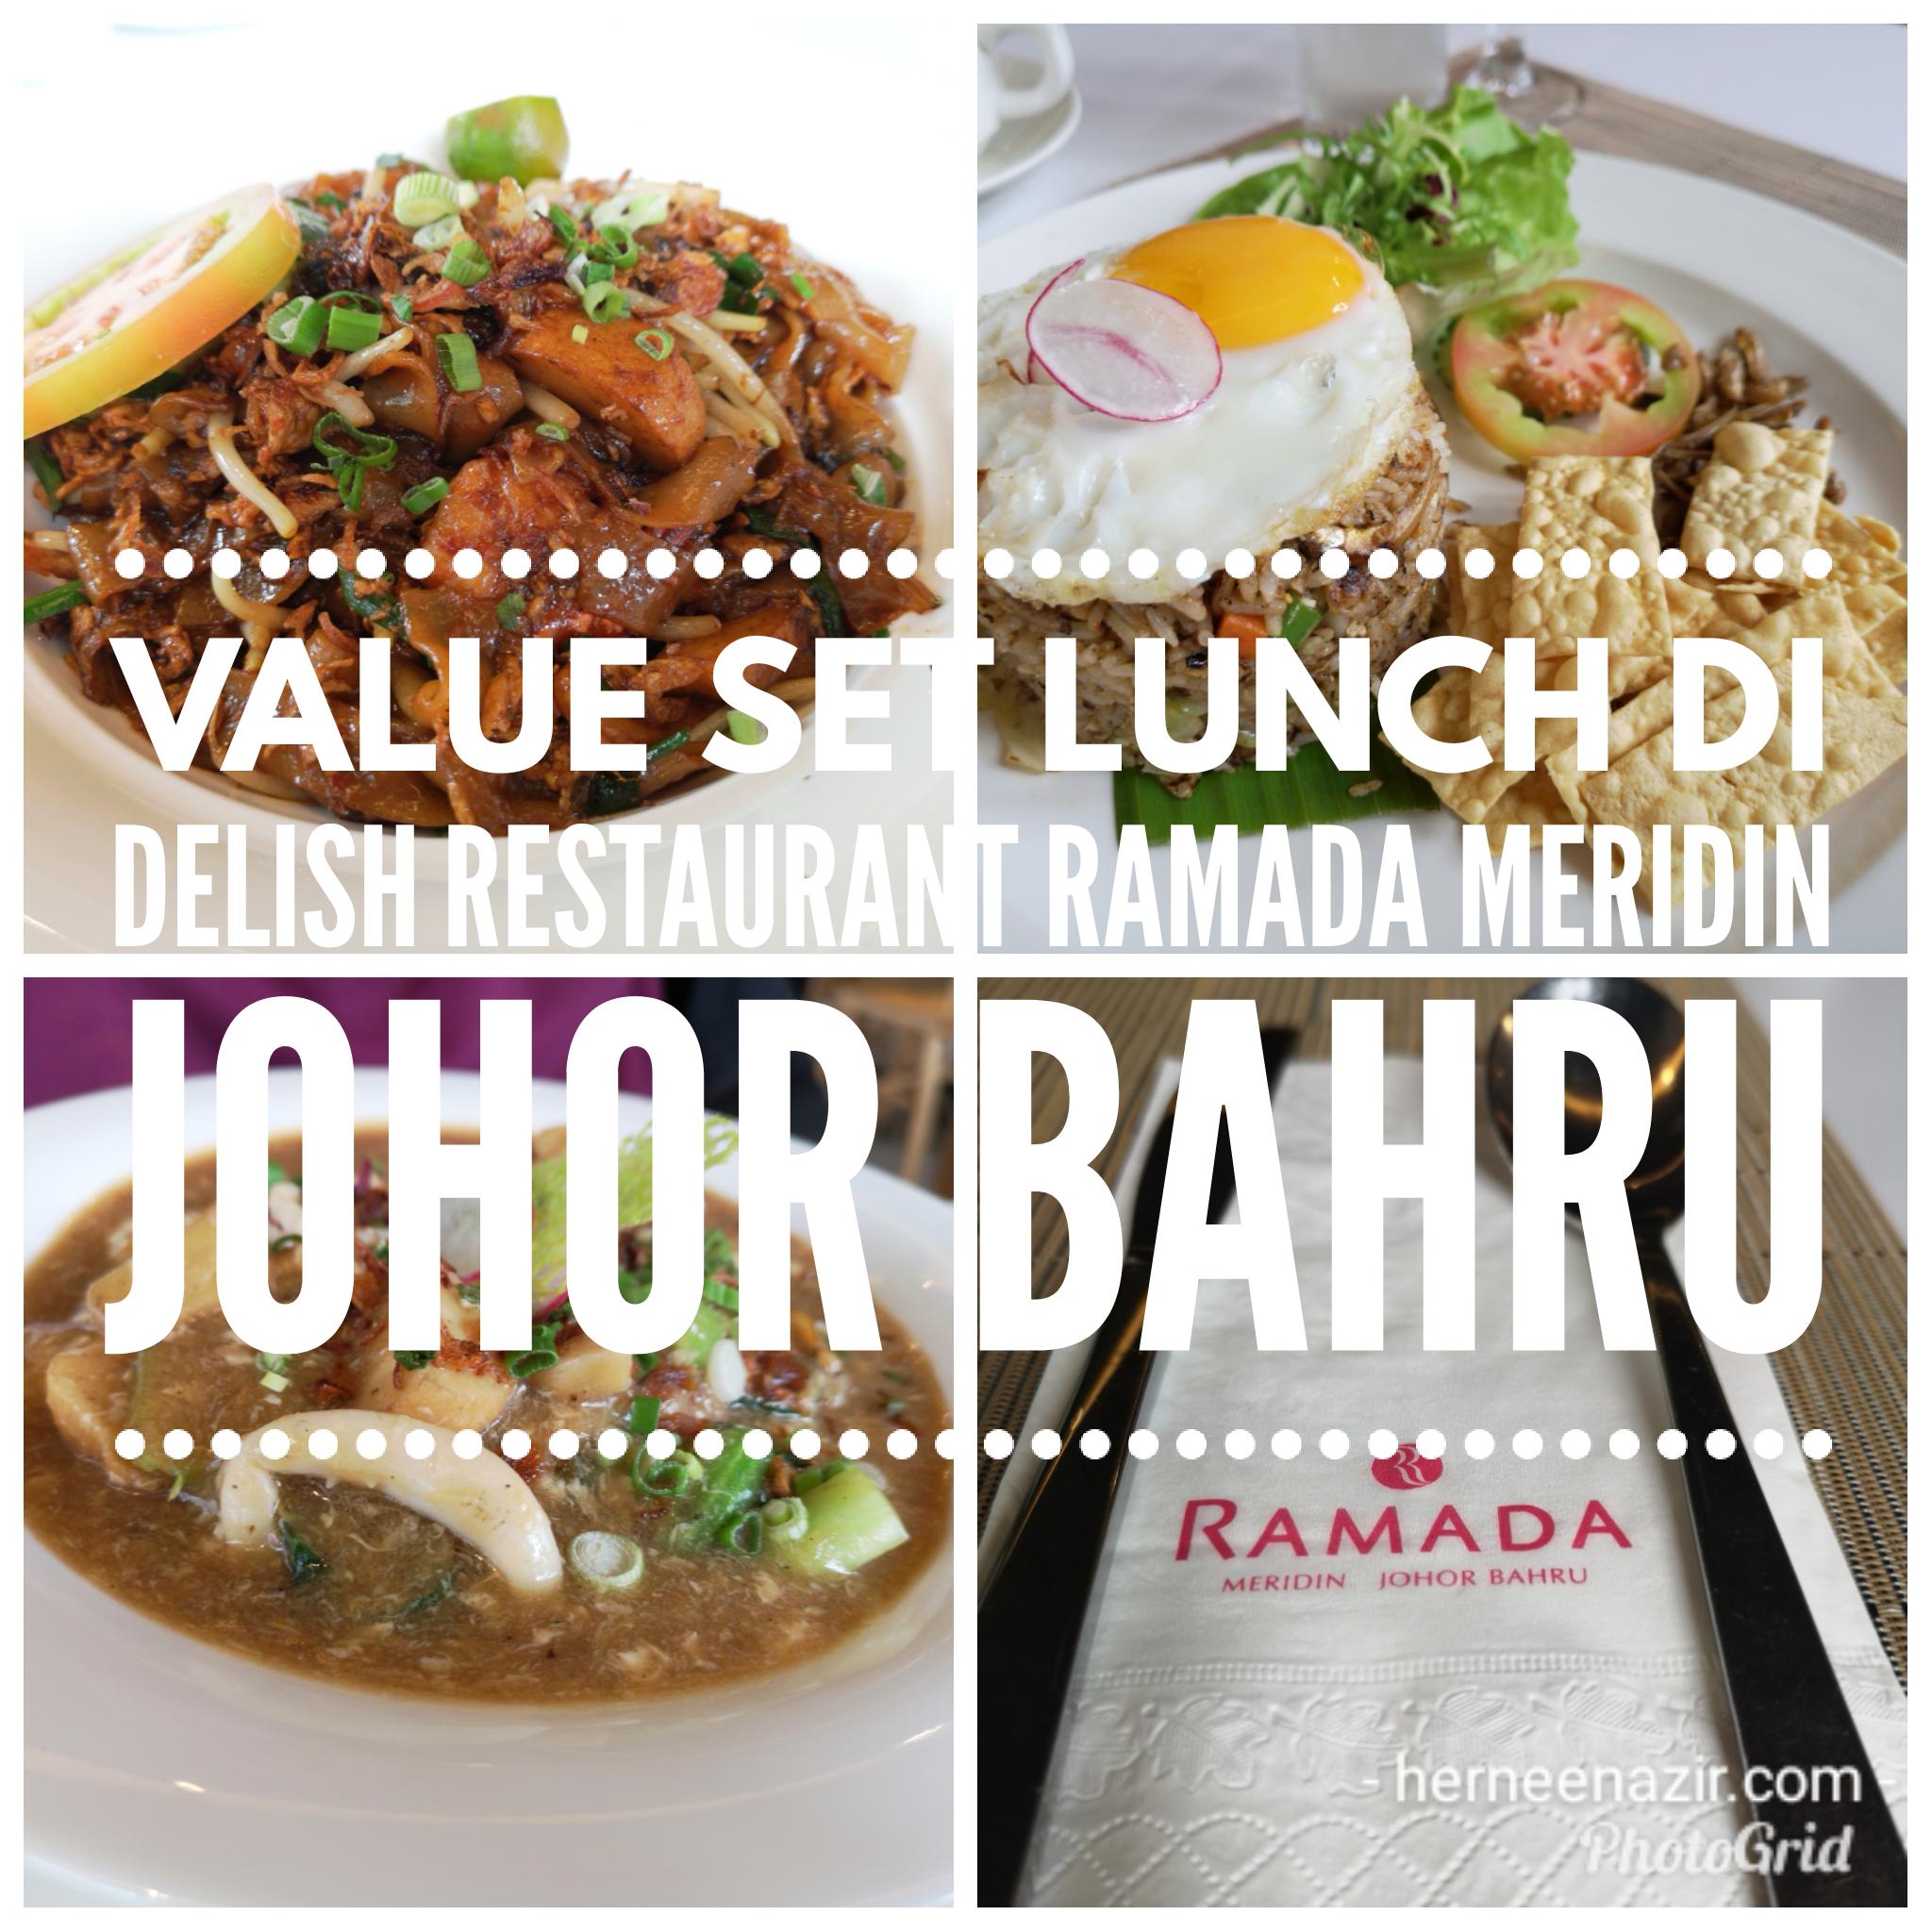 Value Set Lunch Di Delish Restaurant Ramada Meridin Johor Bahru